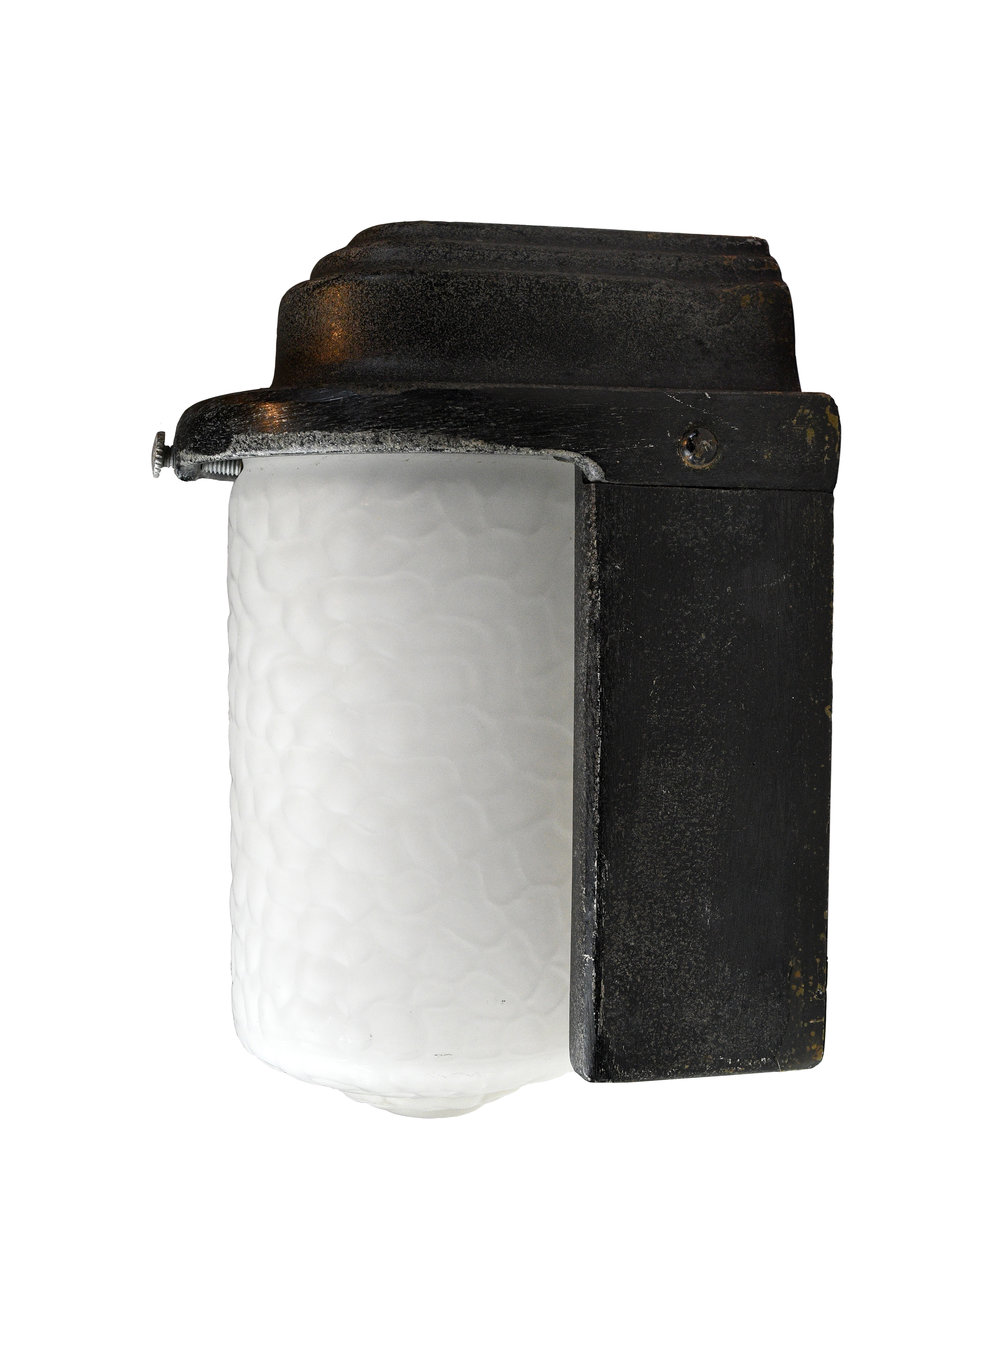 47696-markel-mcm-deco-aluminum-sconce-12.jpg